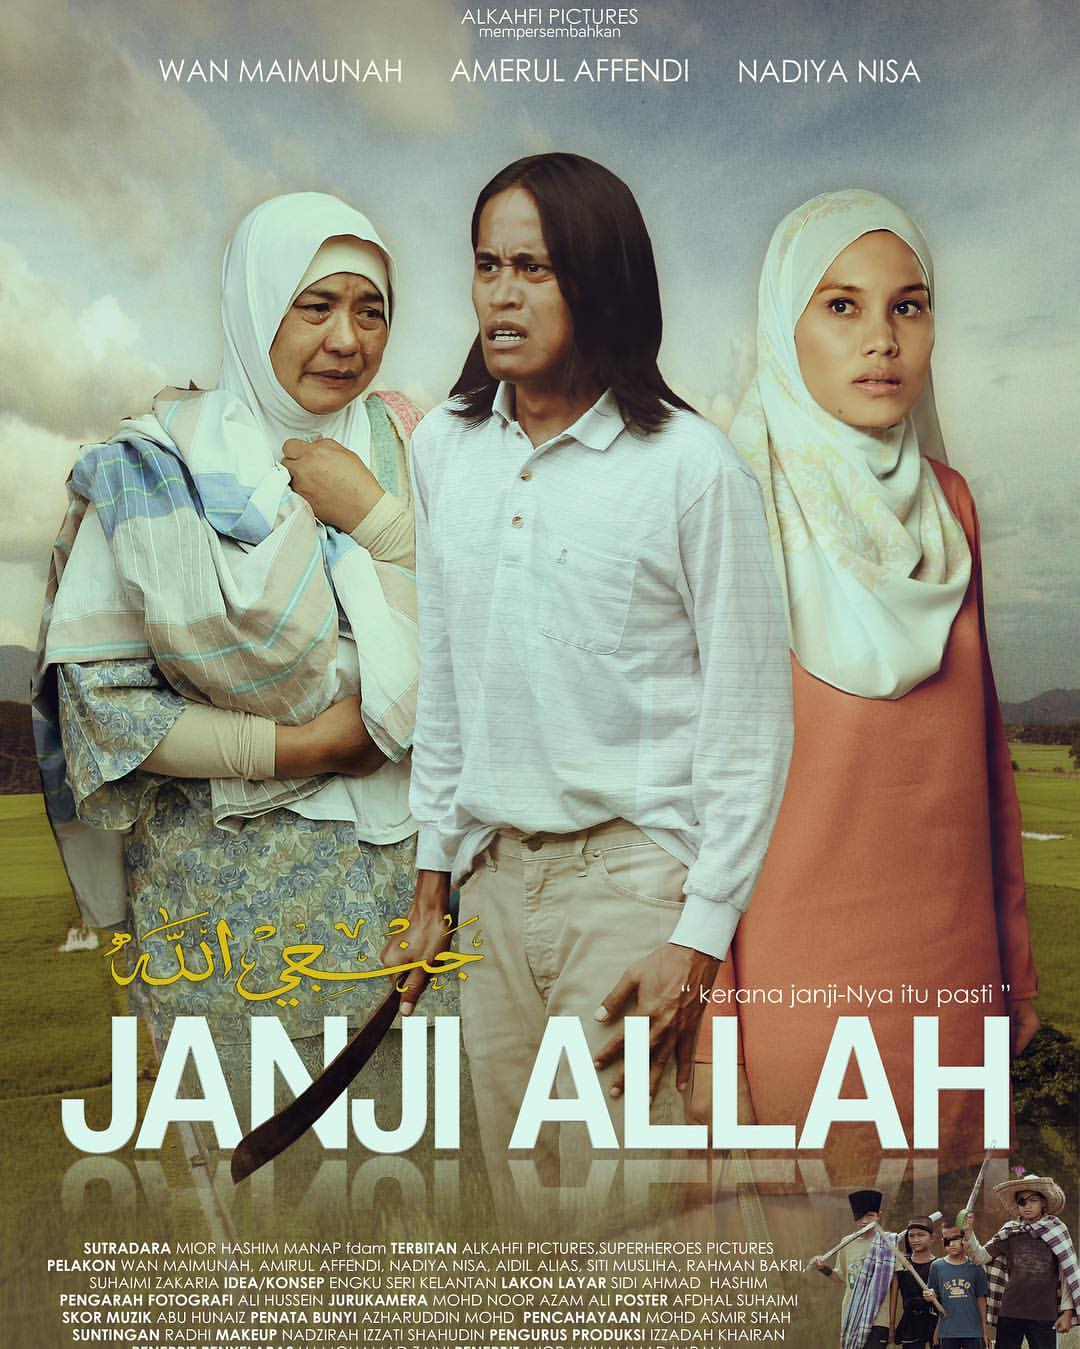 Janji Allah (TV1)